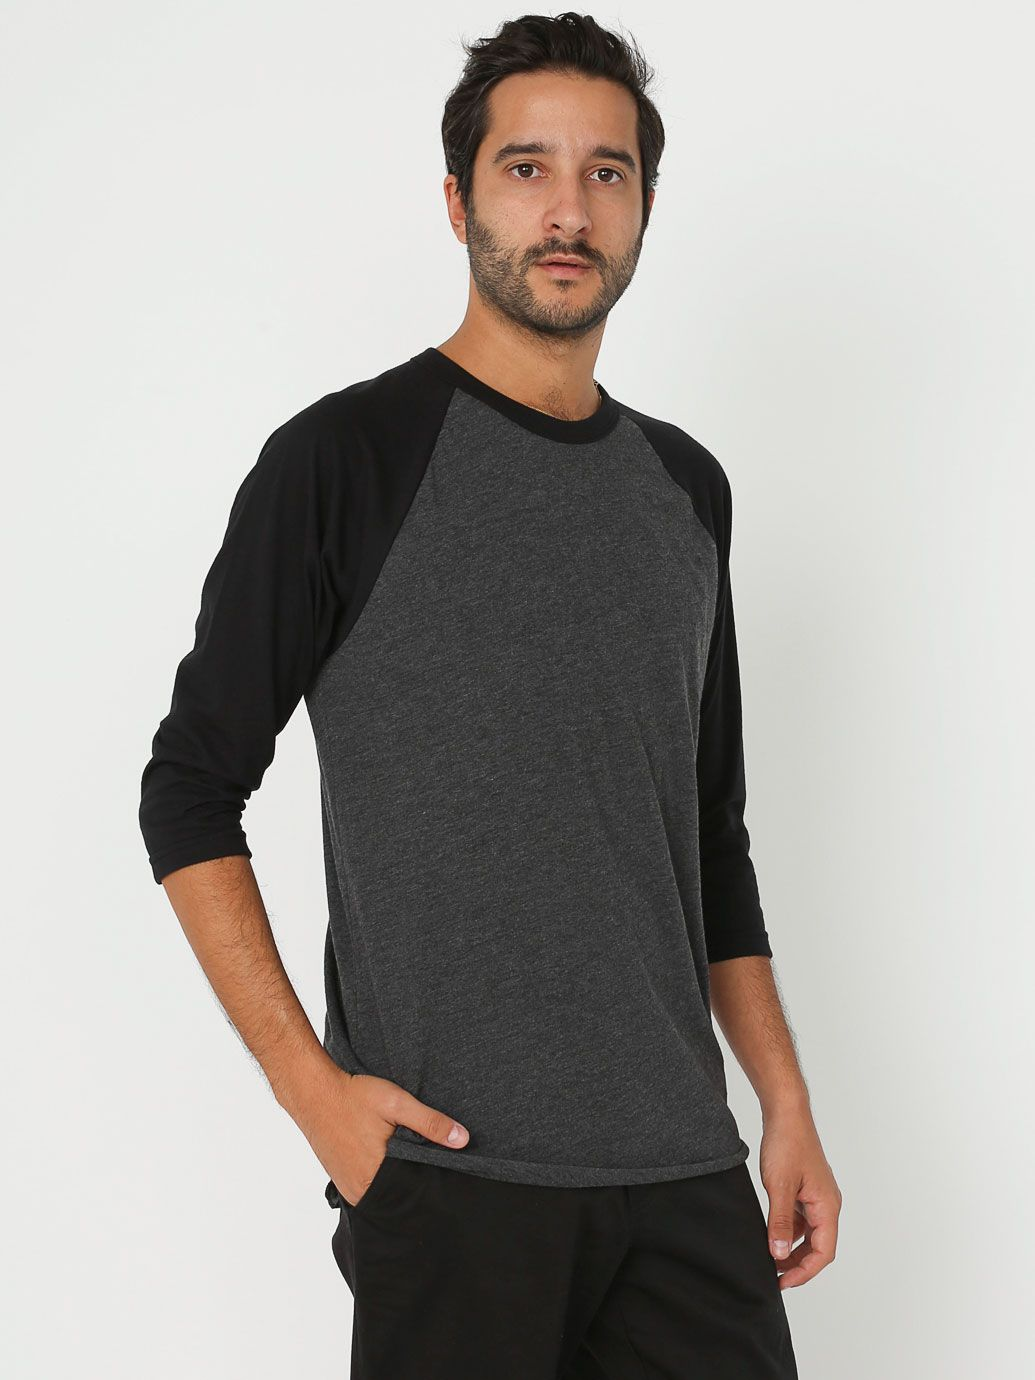 Poly Cotton 3 4 Sleeve Raglan Shirt Unissex Blingby